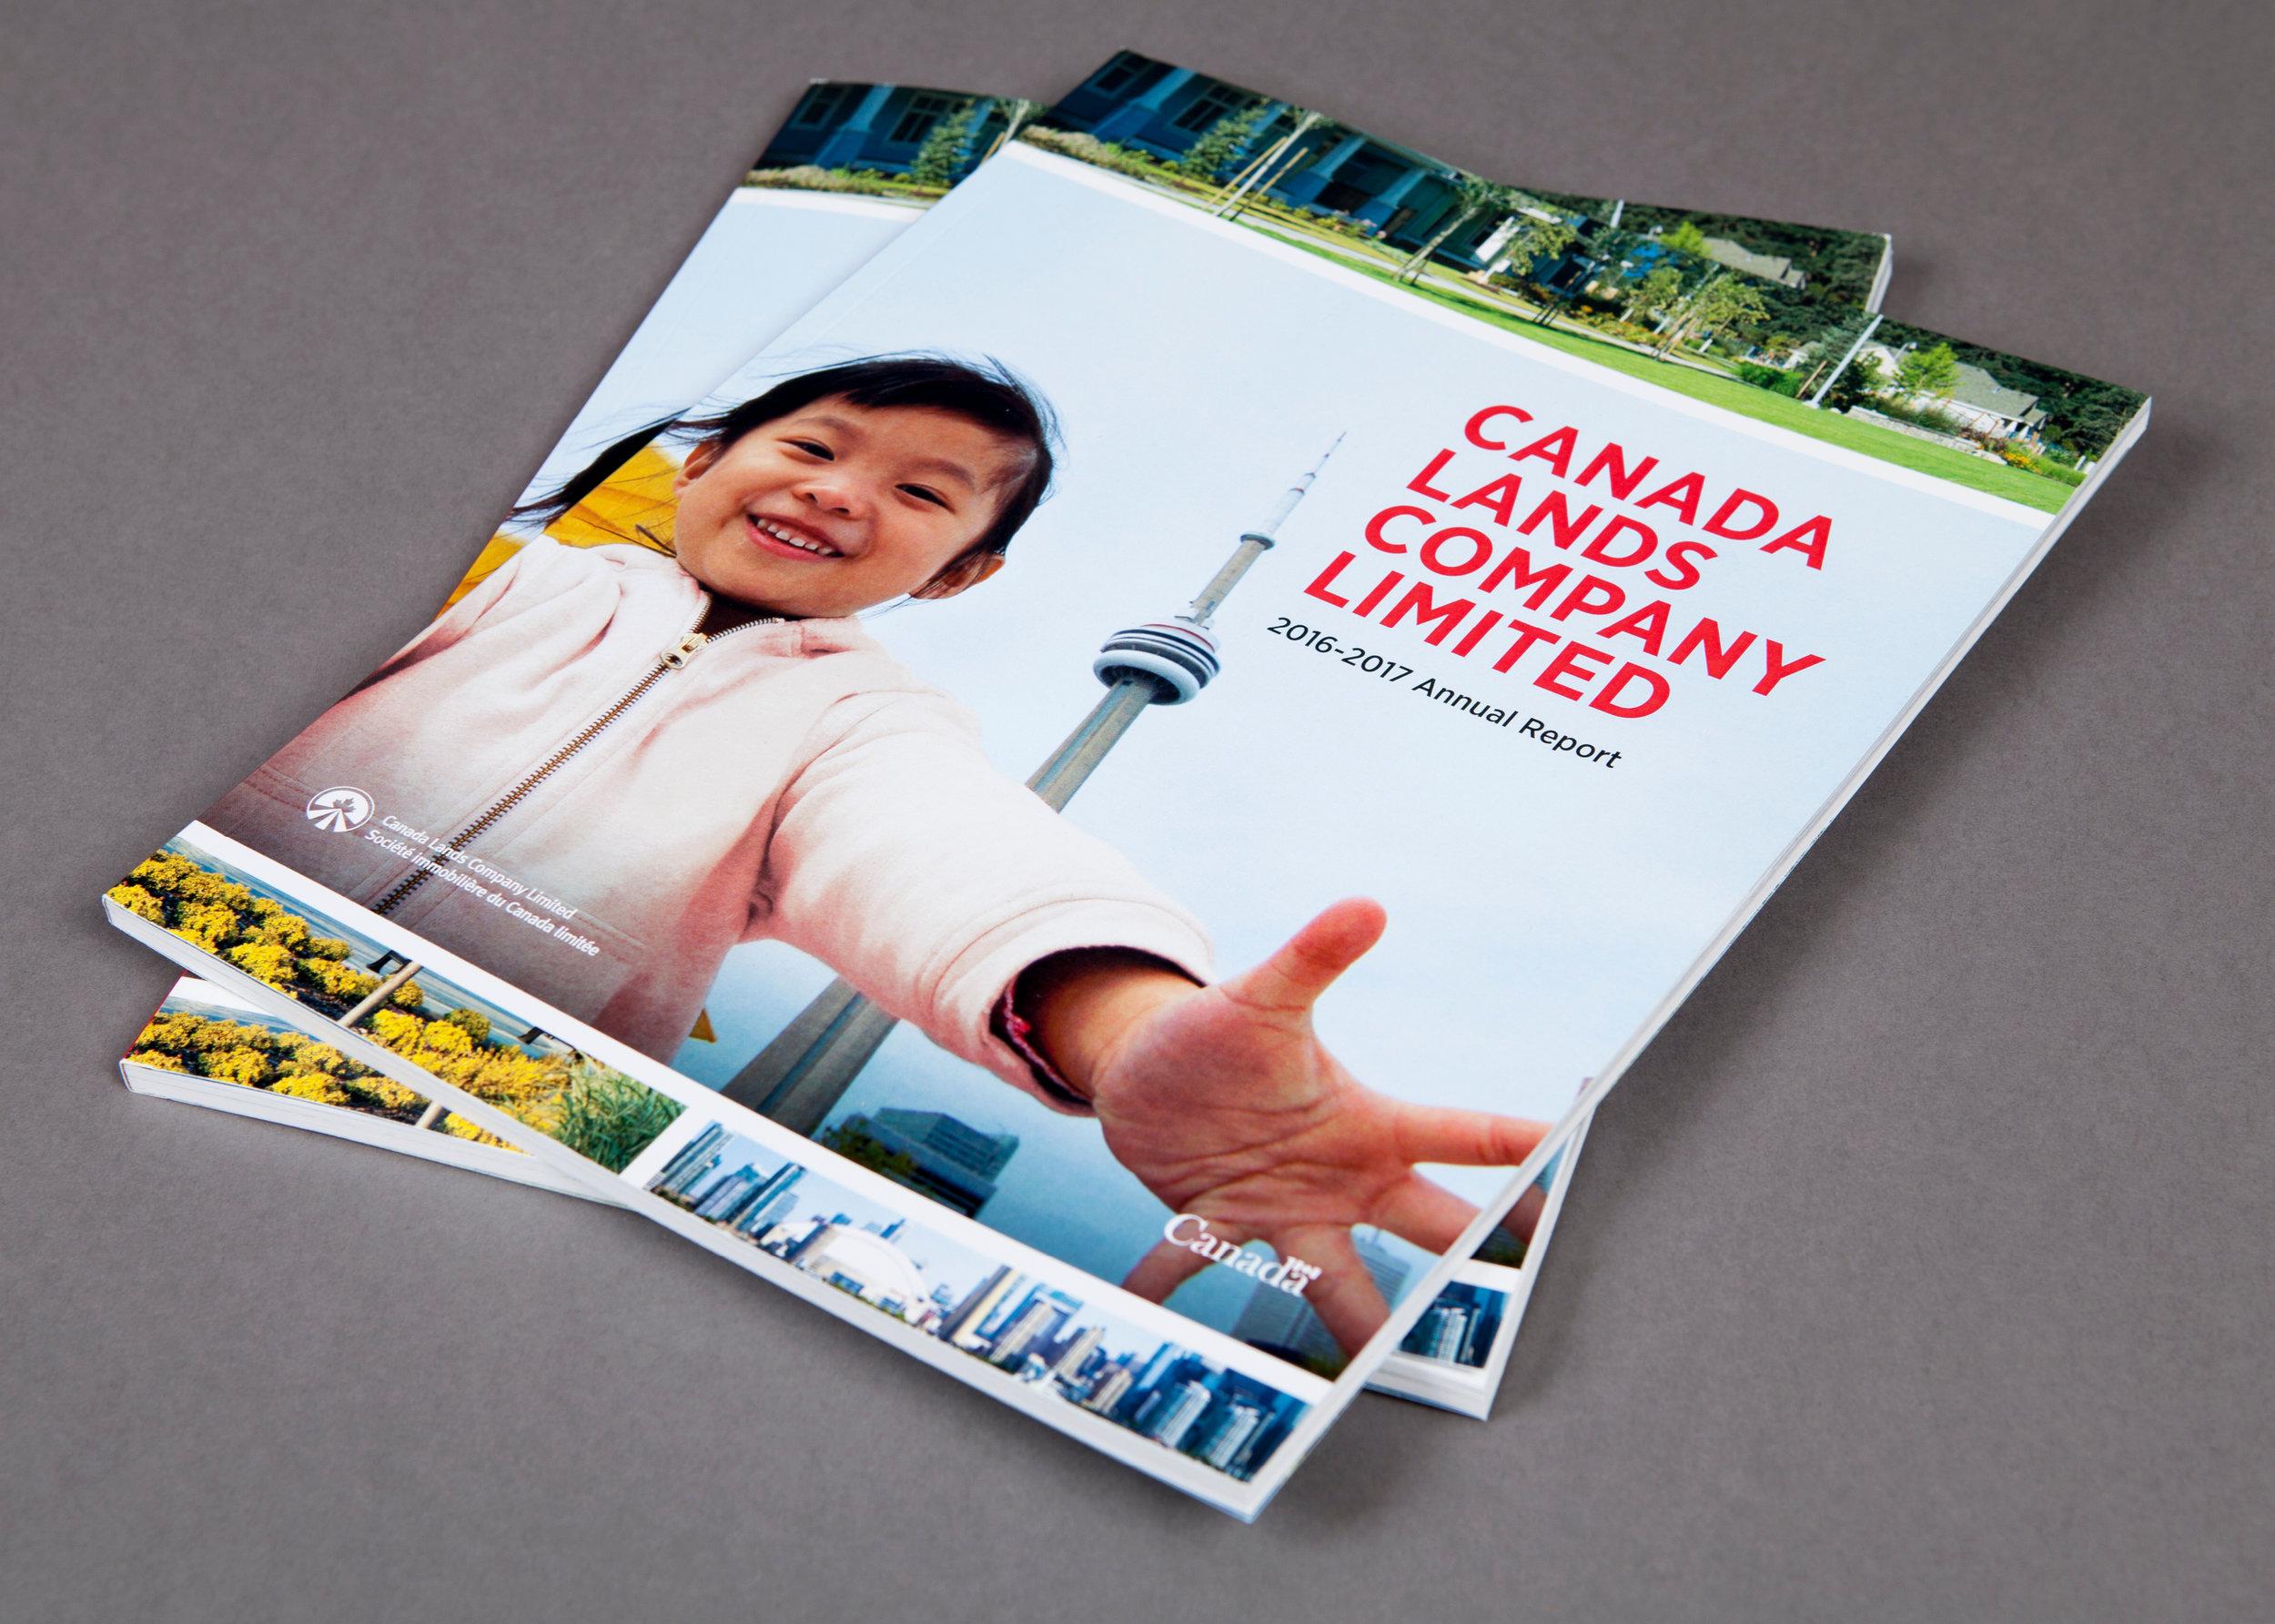 canada-lands-corporation-annual-report-2-sputnik-design-partners-toronto.jpg